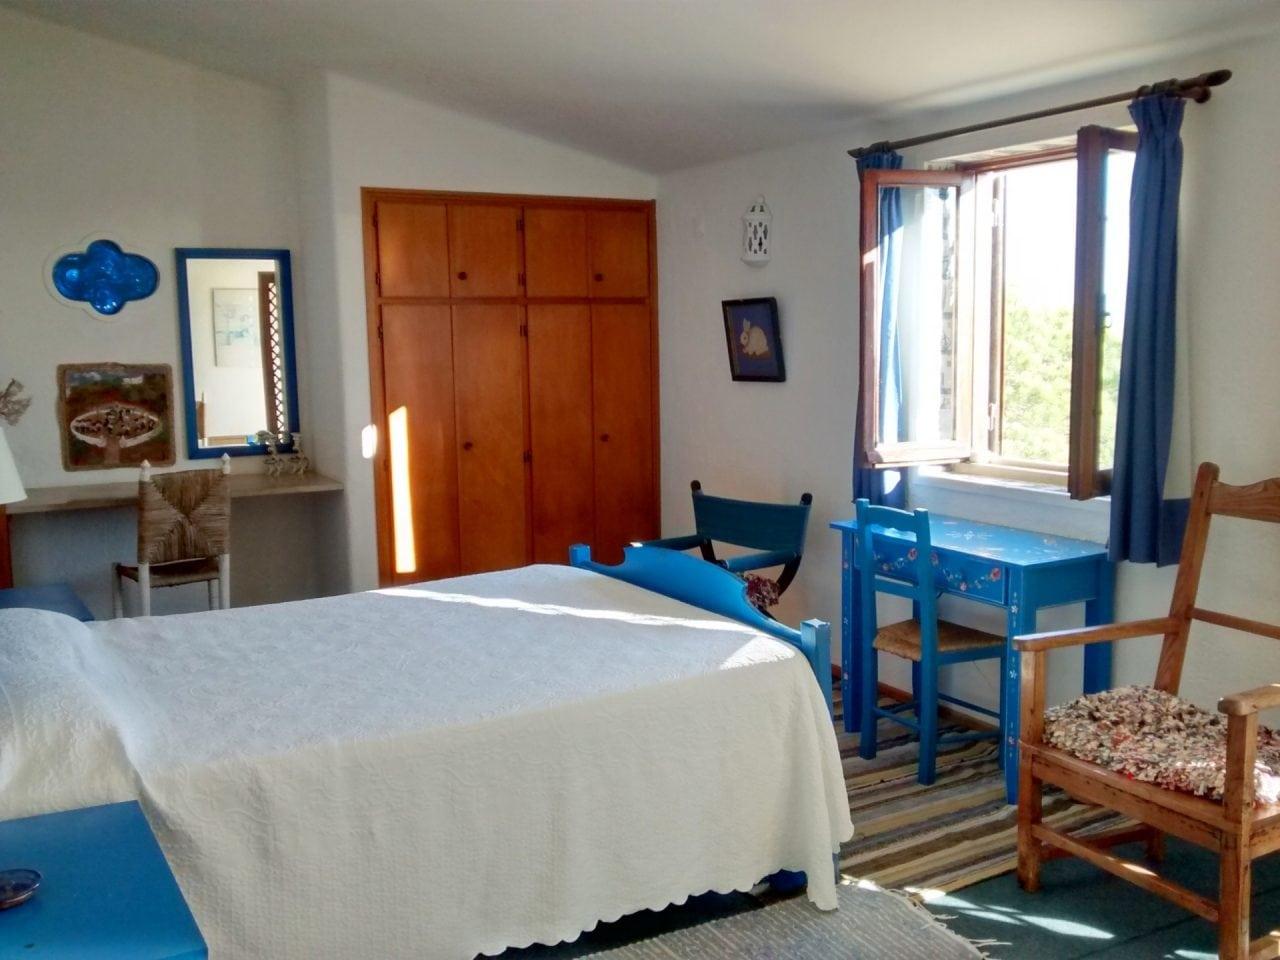 Casa ao Pescareza Praia da Luz5 - Cum arata o investitie rezidentiala de 300.000 euro in posibilitati... globale